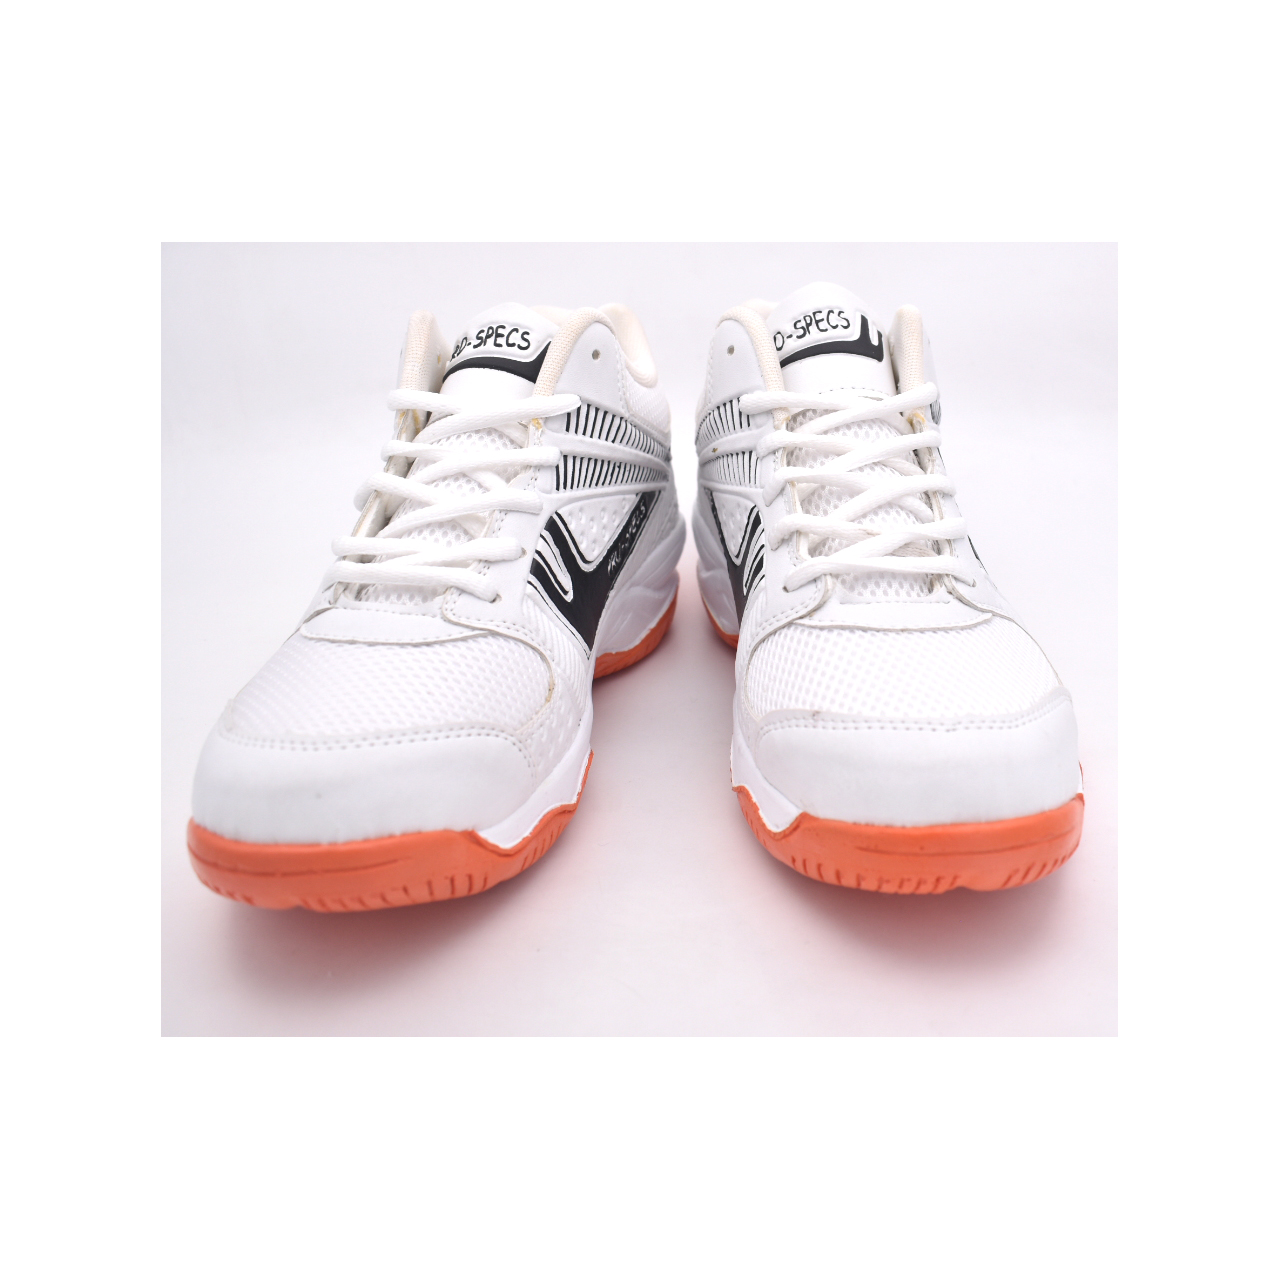 خرید                      کفش والیبال مردانه کد C-5028